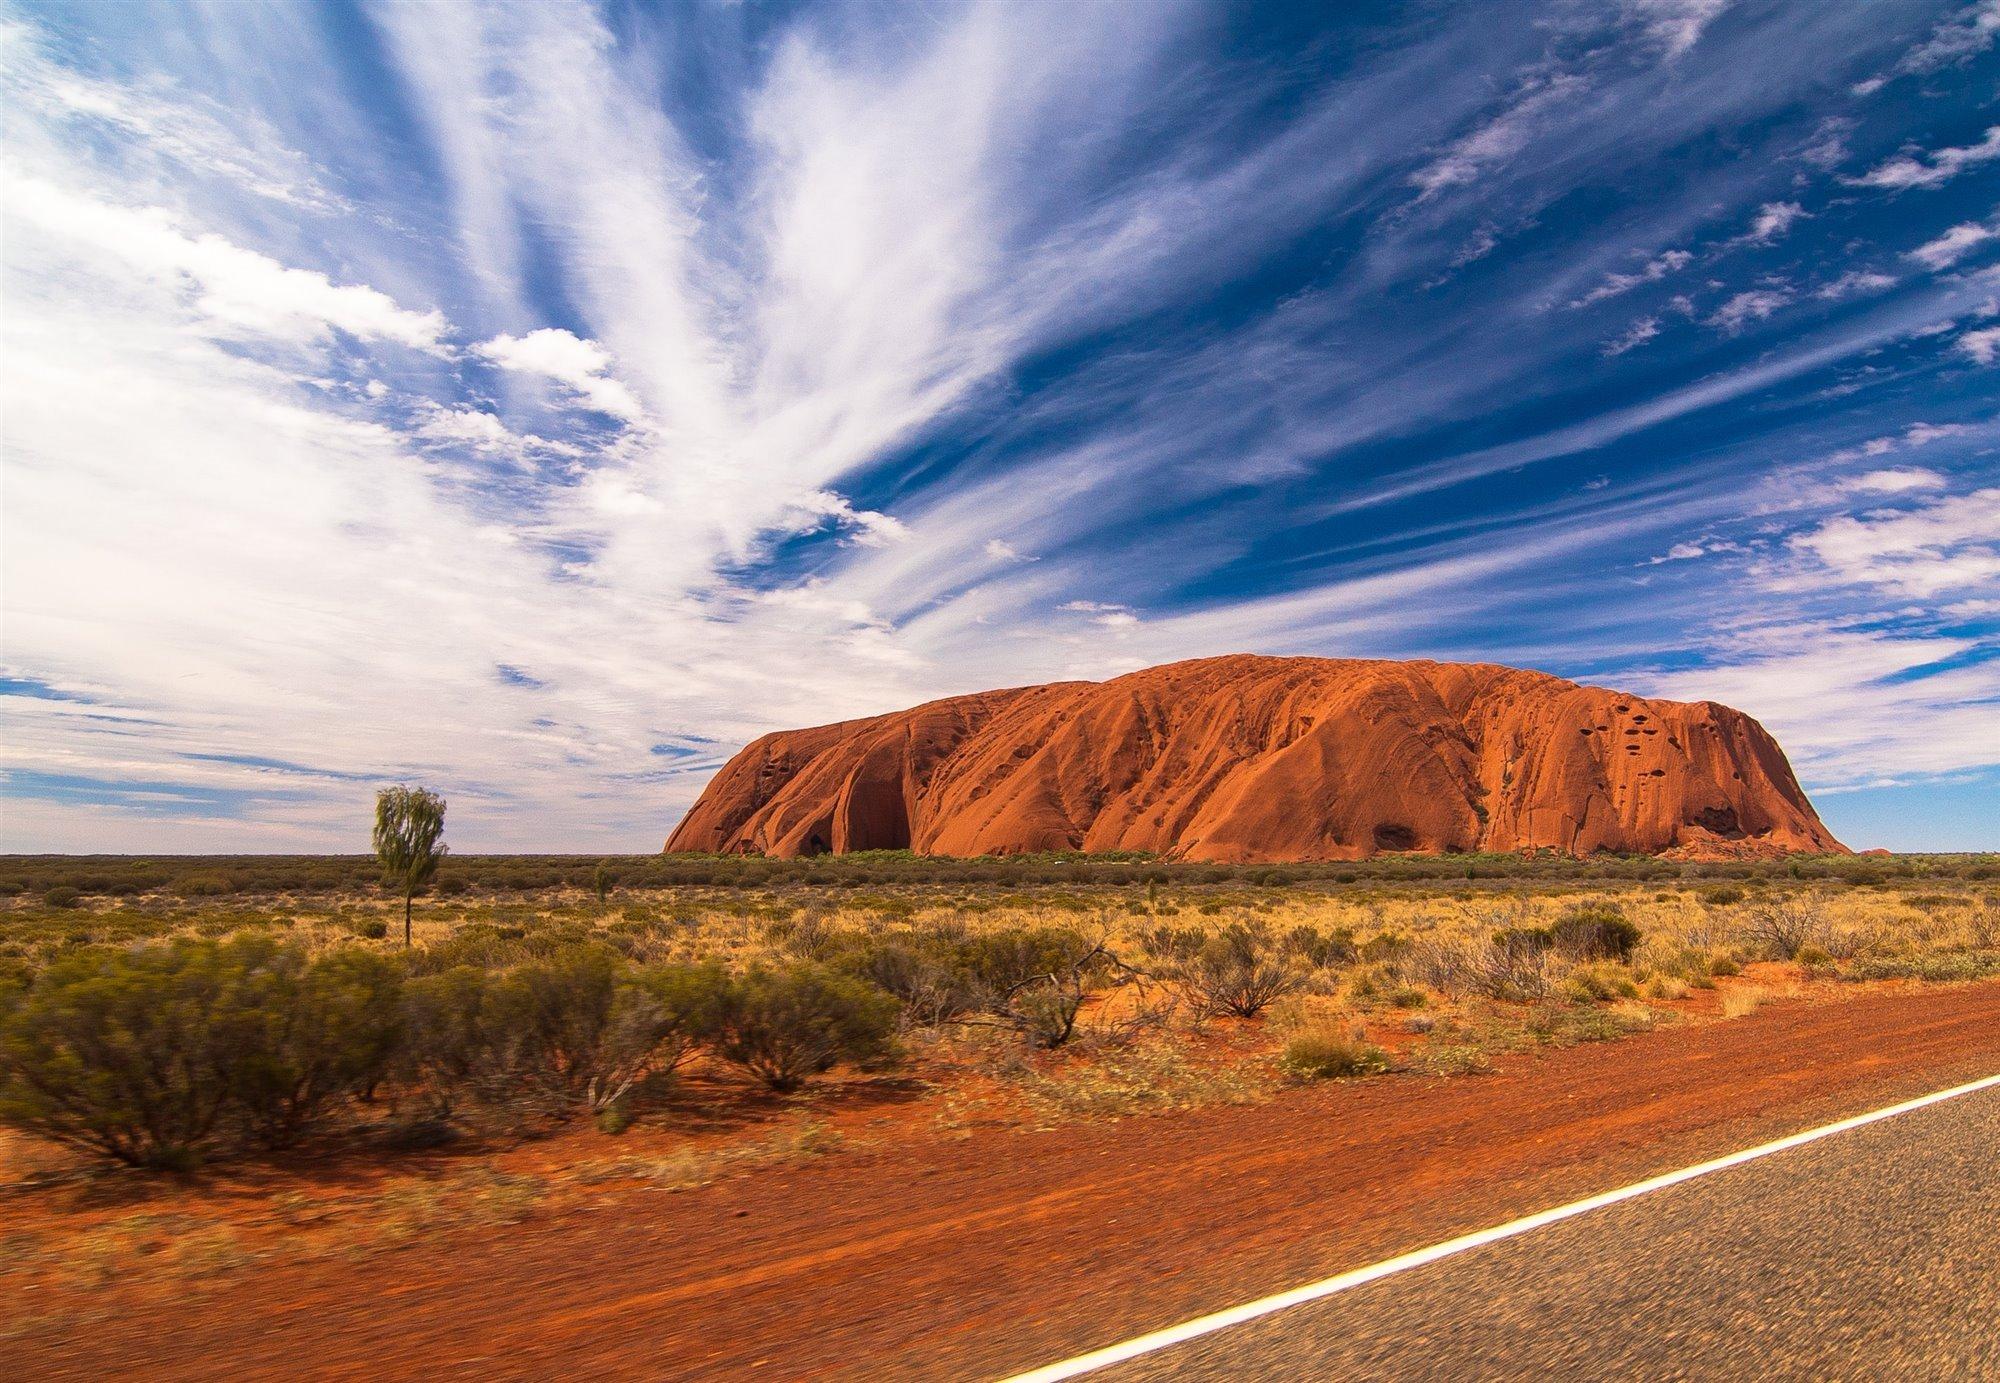 holger-link-1GFUOji-yck-unsplash. Rumbo a Uluru